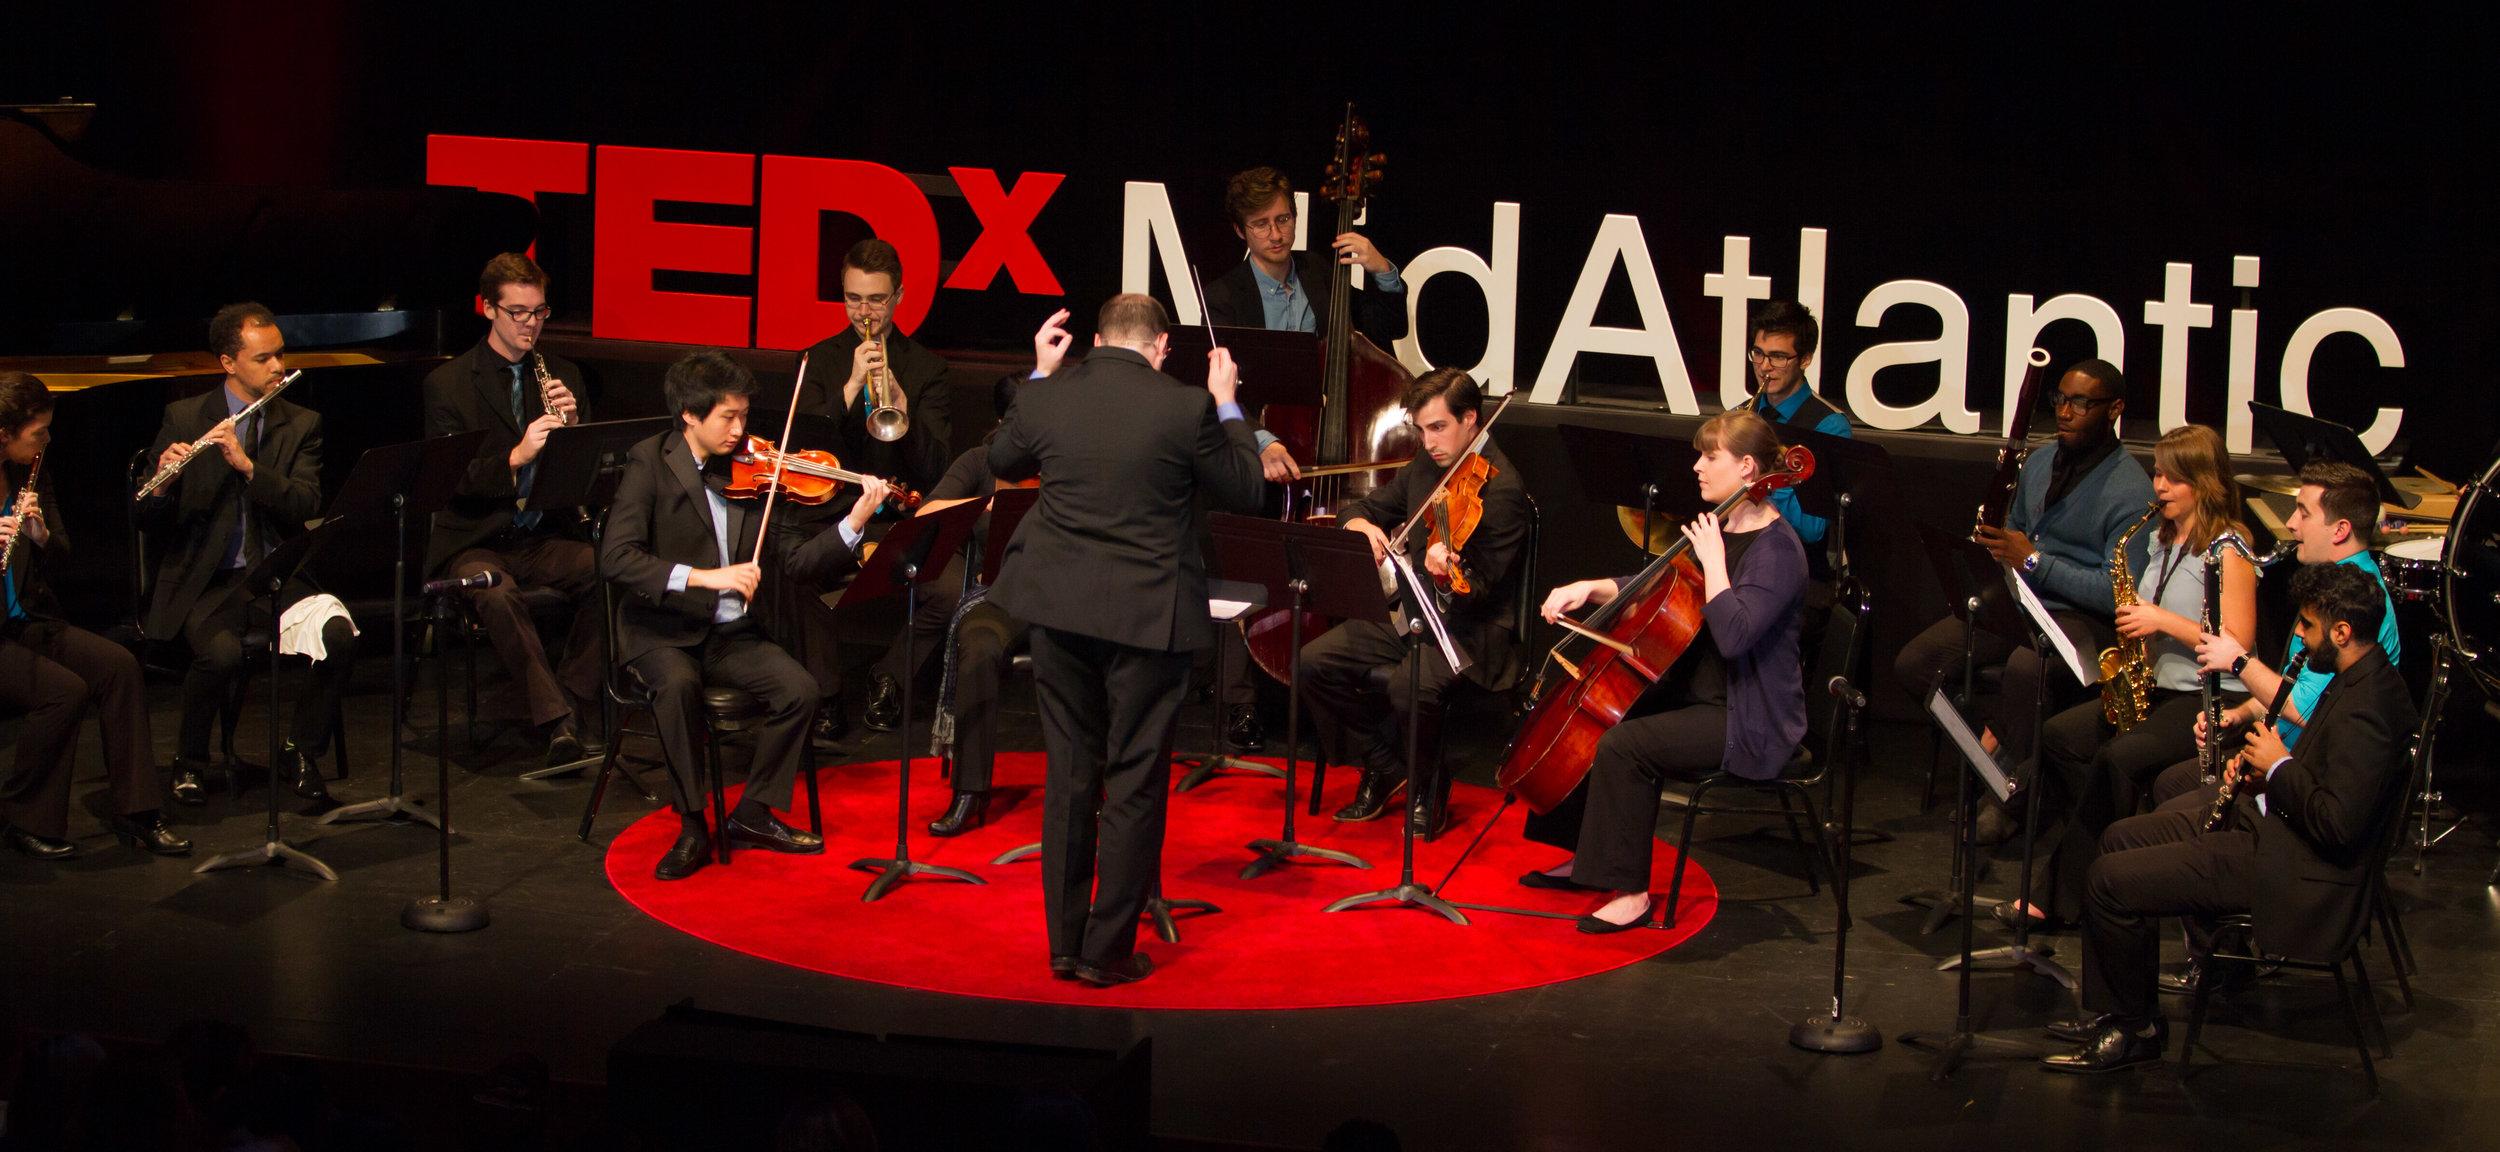 Jordan Conducts SNO at TEDxMidAtlantic 2017